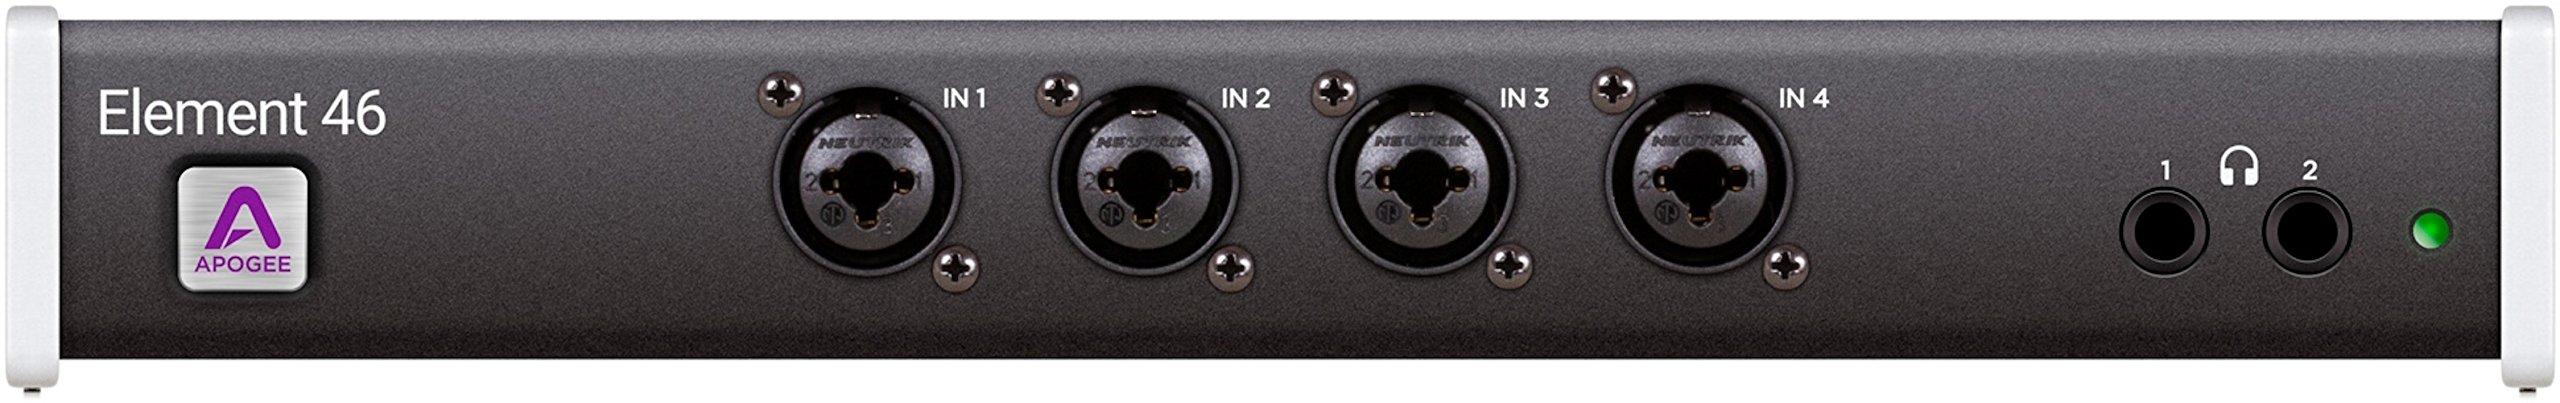 Apogee ELEMENT 46 Thunderbolt Audio Interface